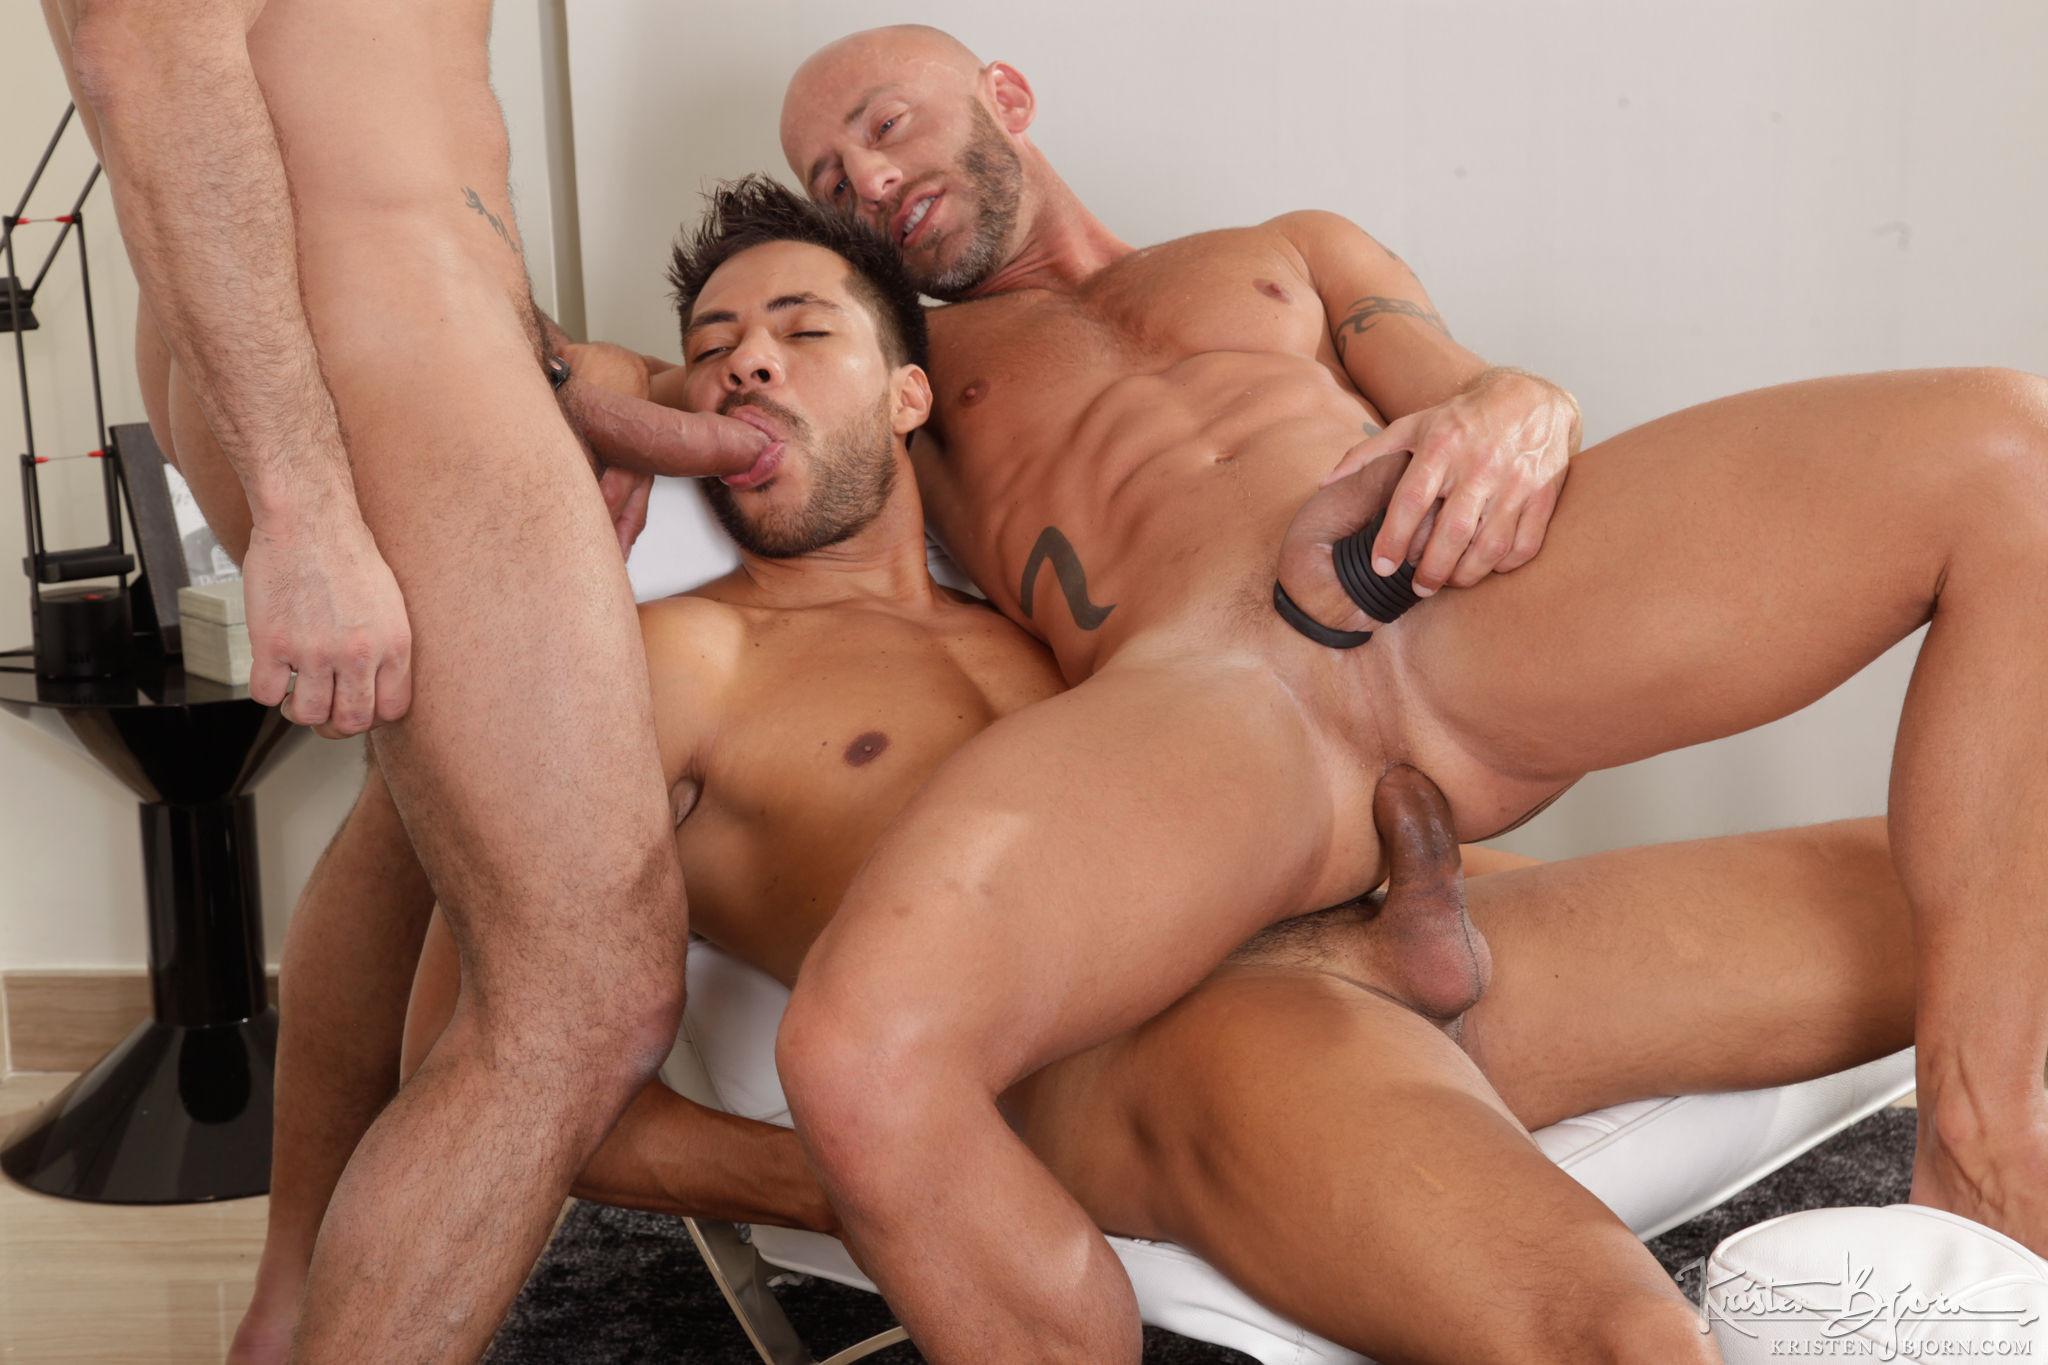 Anal inter brasileiro - 3 part 1